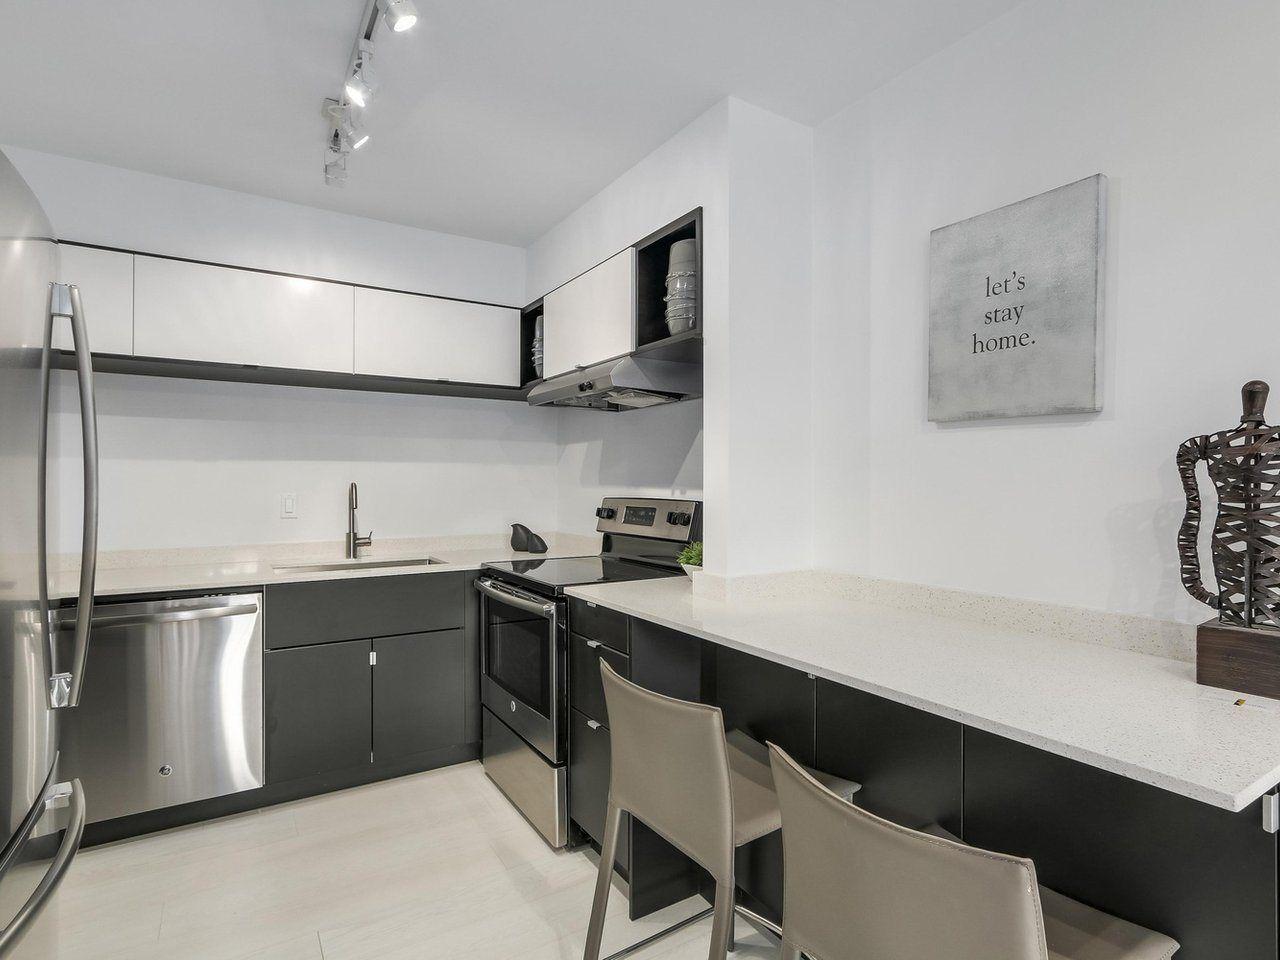 Enchanting Tuc Craft Kitchen Sketch - Kitchen Cabinets | Ideas ...